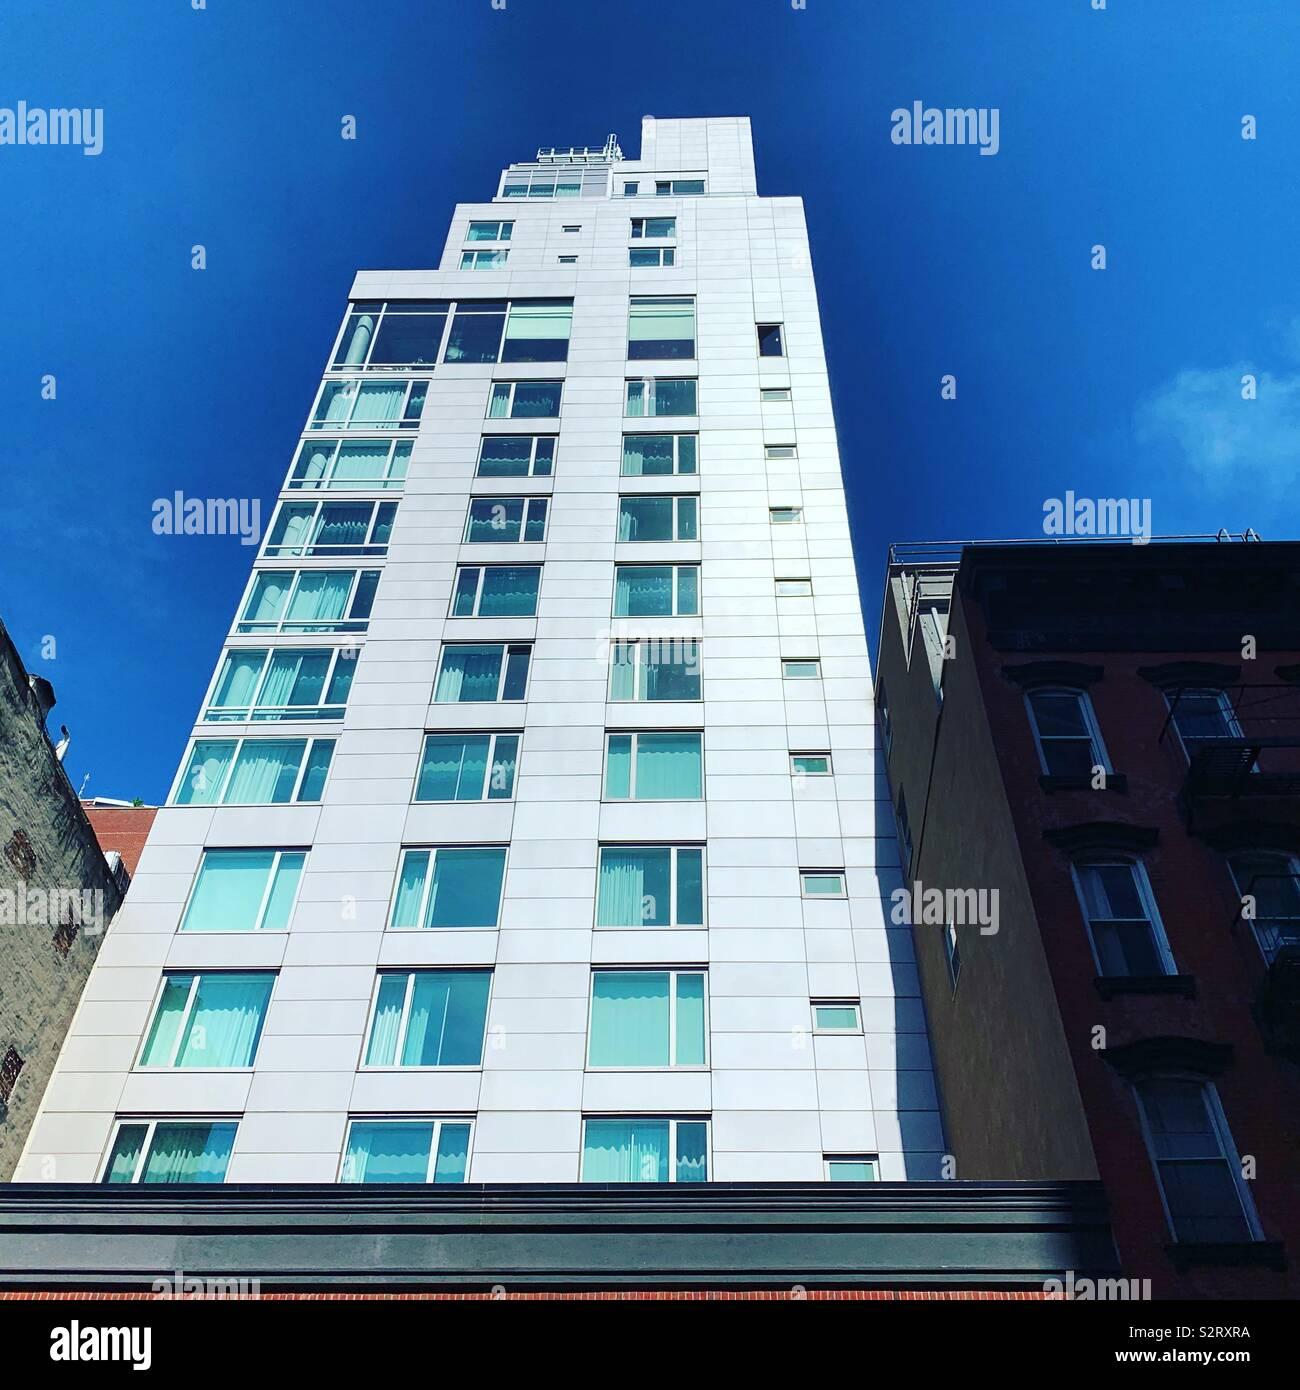 Hotel Indigo Lower East Side, New York City - Stock Image